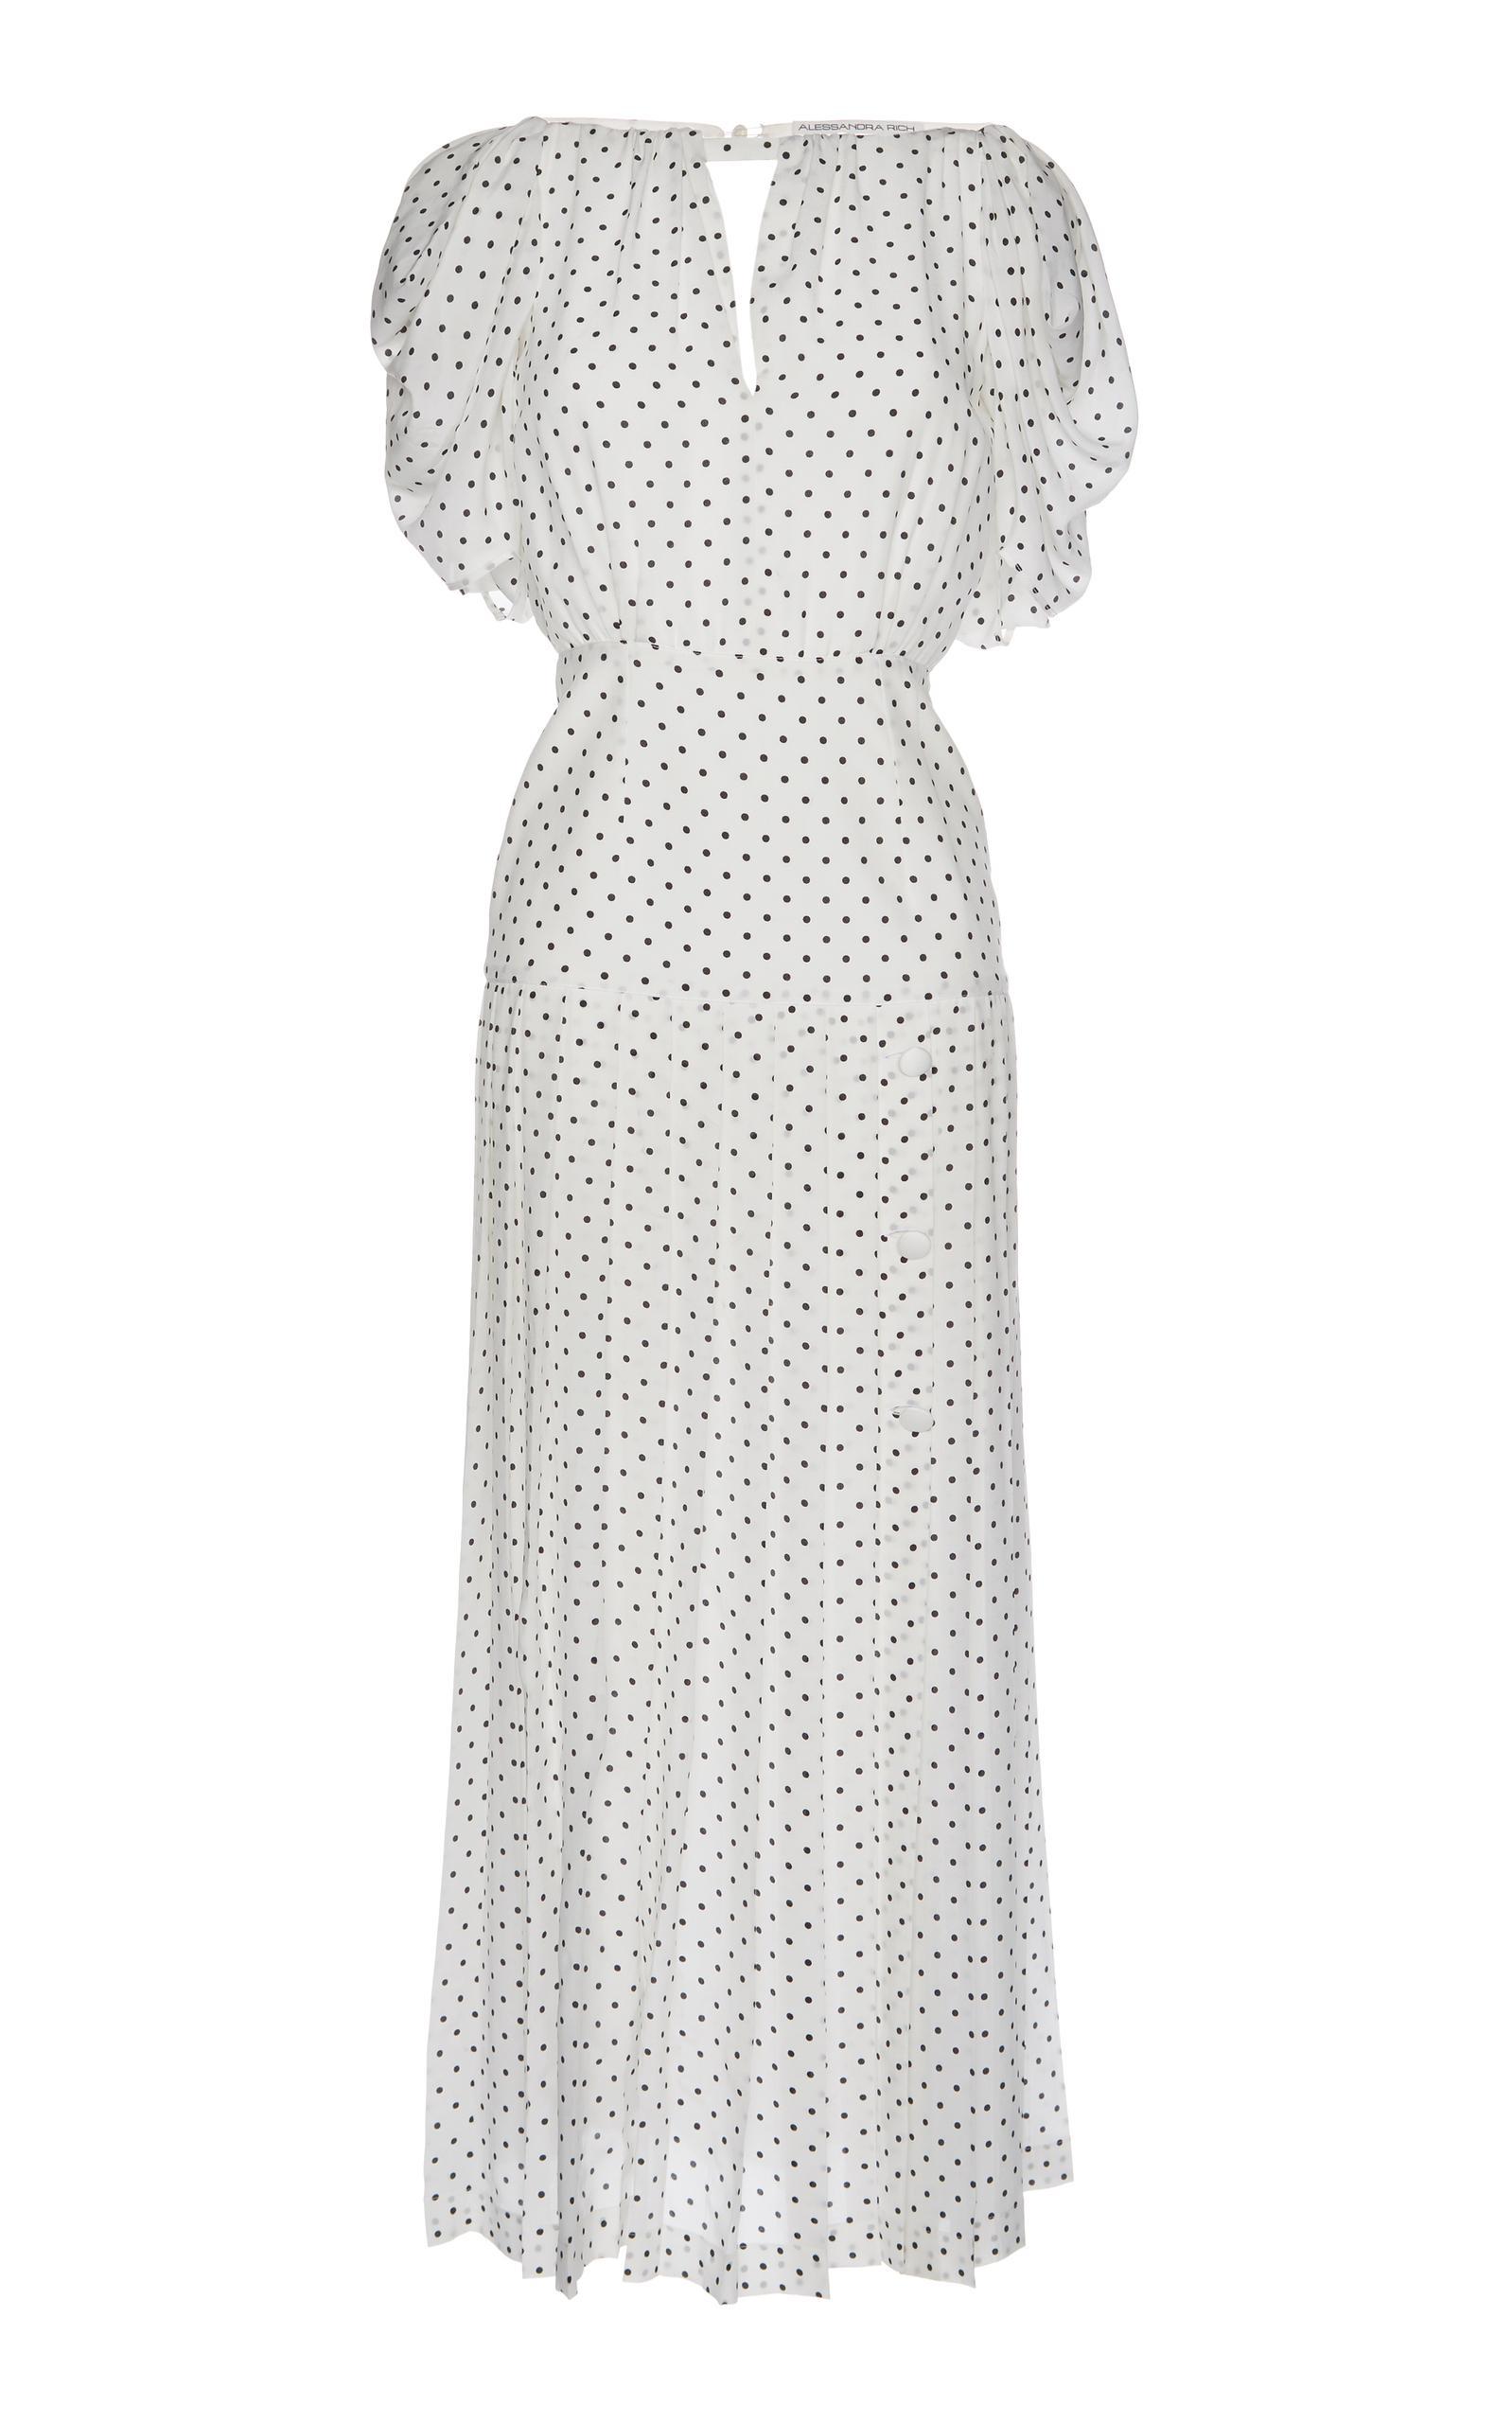 Alessandra Rich Polka Dot Maxi Dress In White